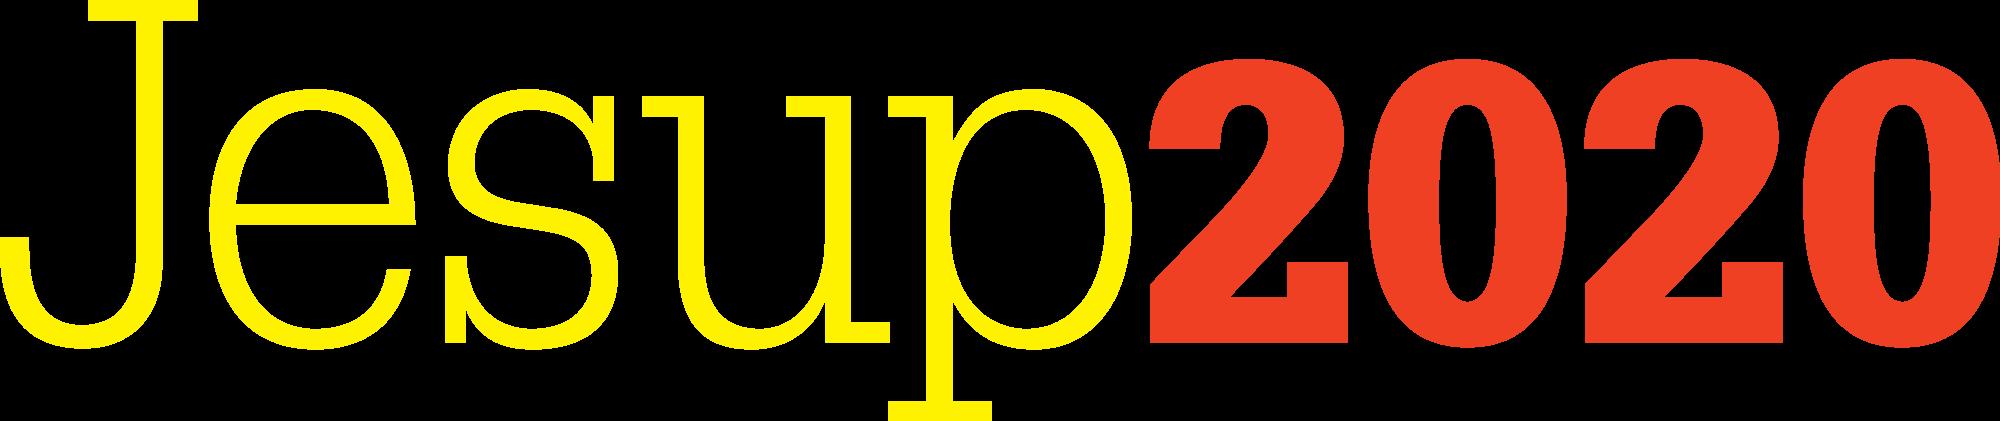 j2020-line.png